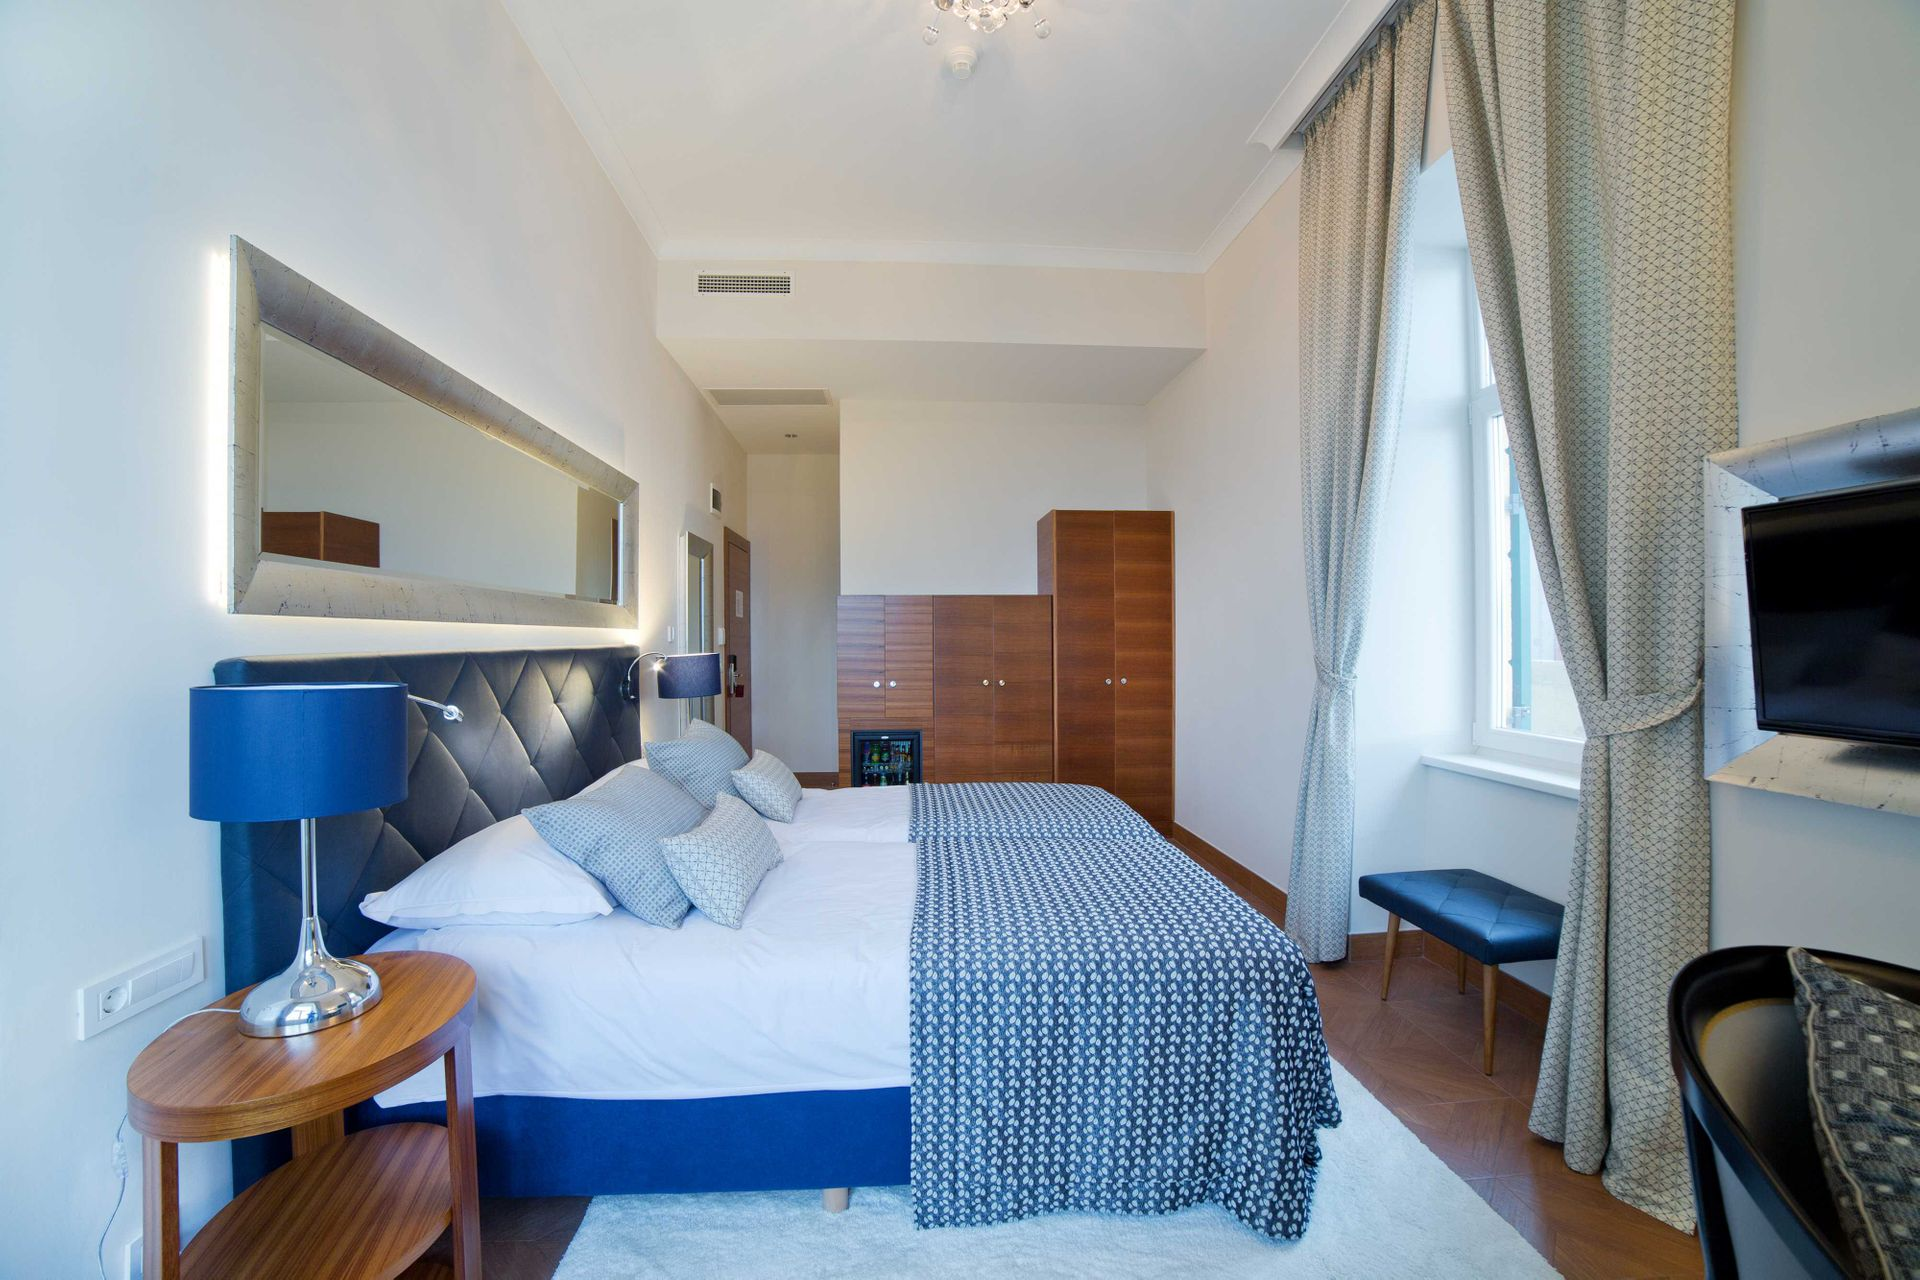 Deluxe Twin Room Villa Royal 28 m² Courtyard/Garden View-2